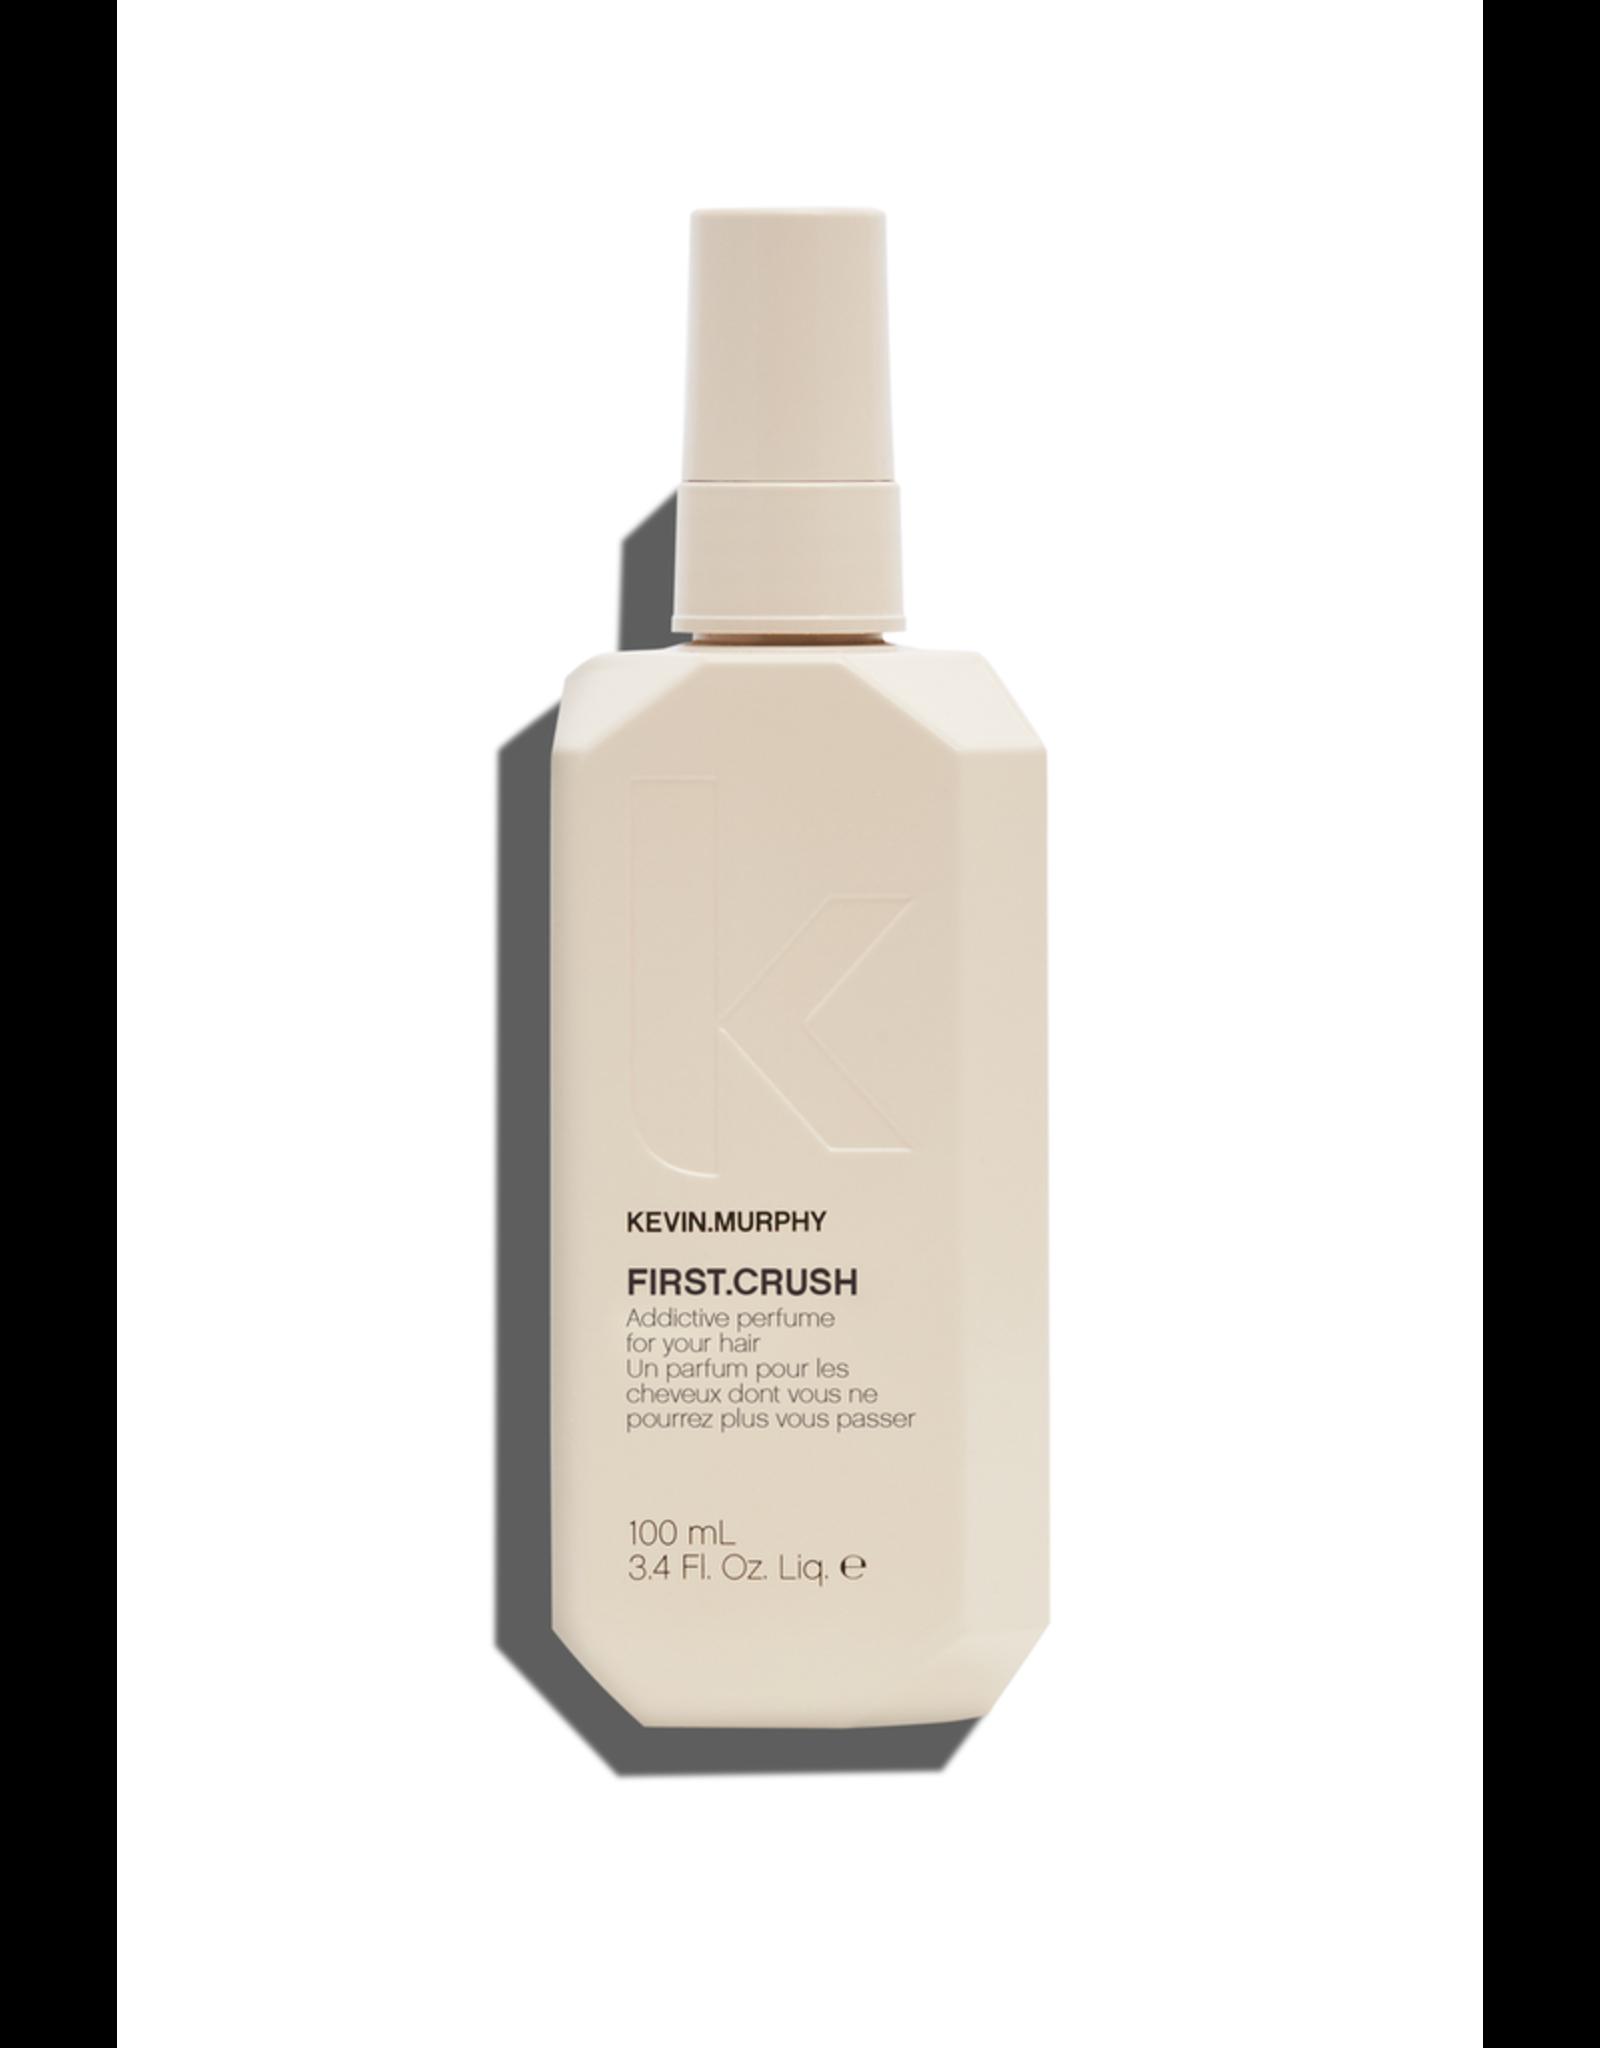 KEVIN.MURPHY First.Crush Hair Perfume